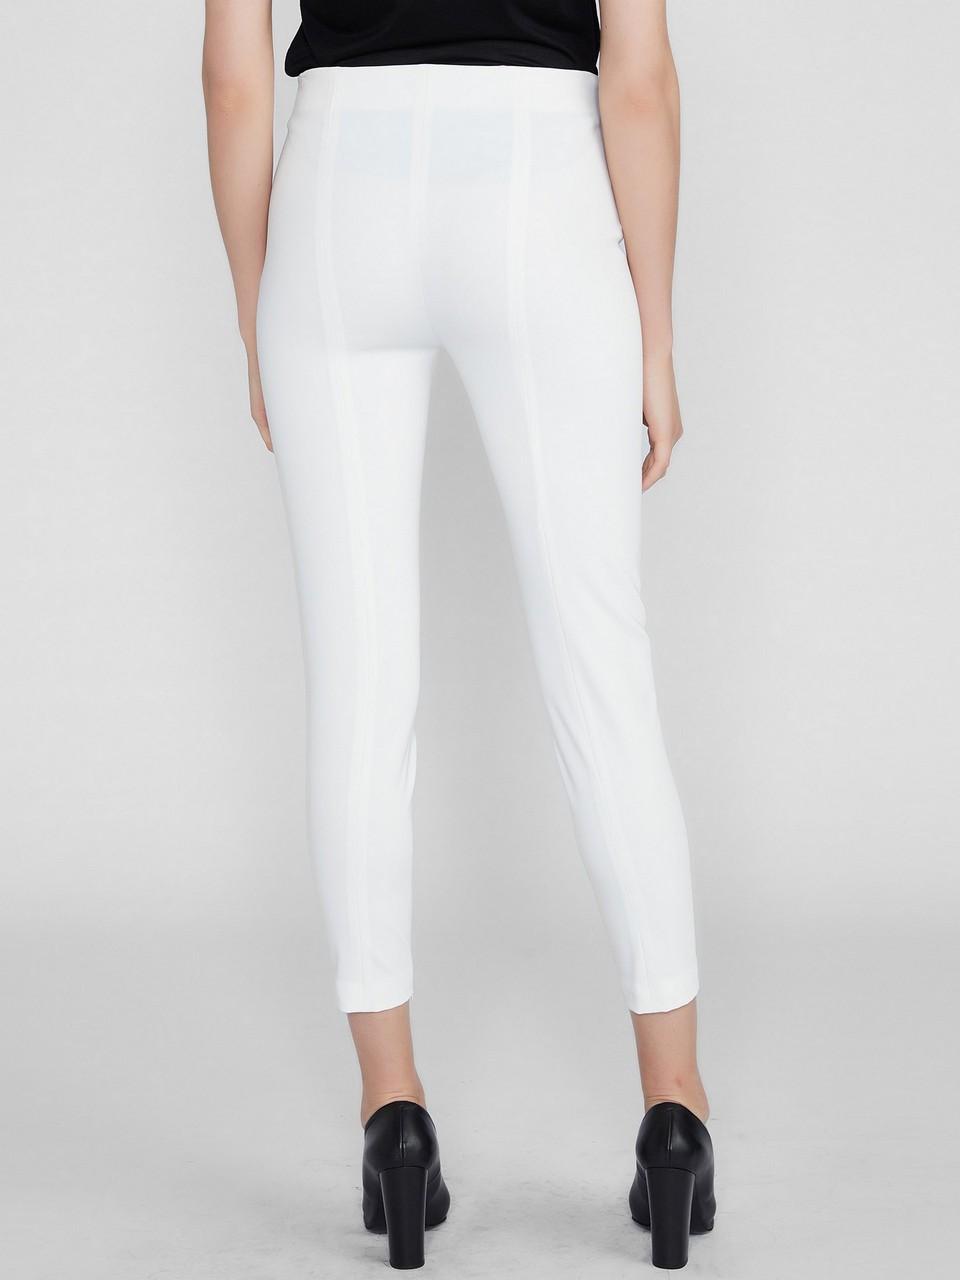 Yandan Fermuarlı Slim Fit Pantolon